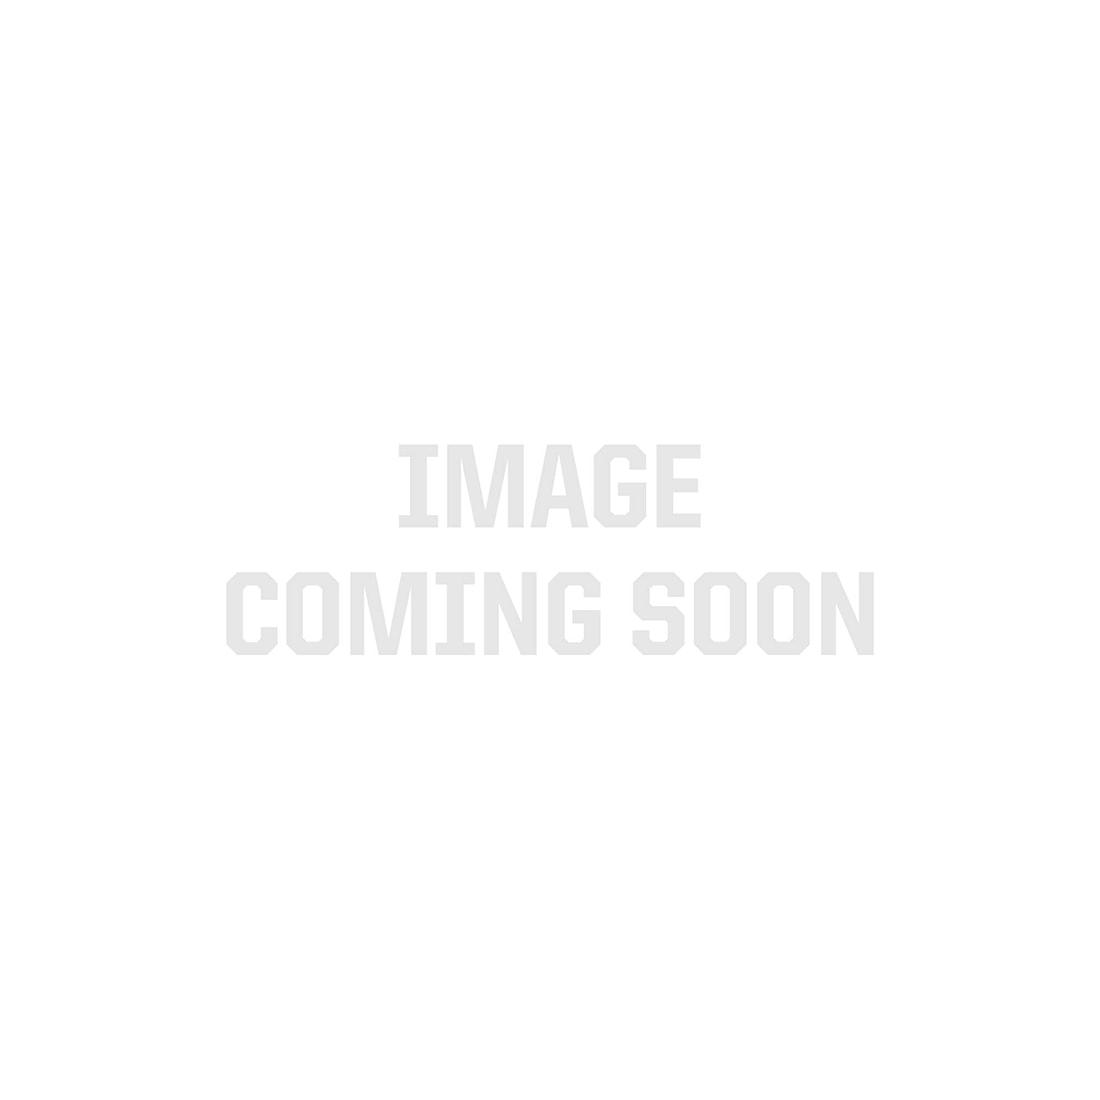 Waterproof Neutral White 3528 LED Strip Light, 60/m, 8mm wide, Sample Kit